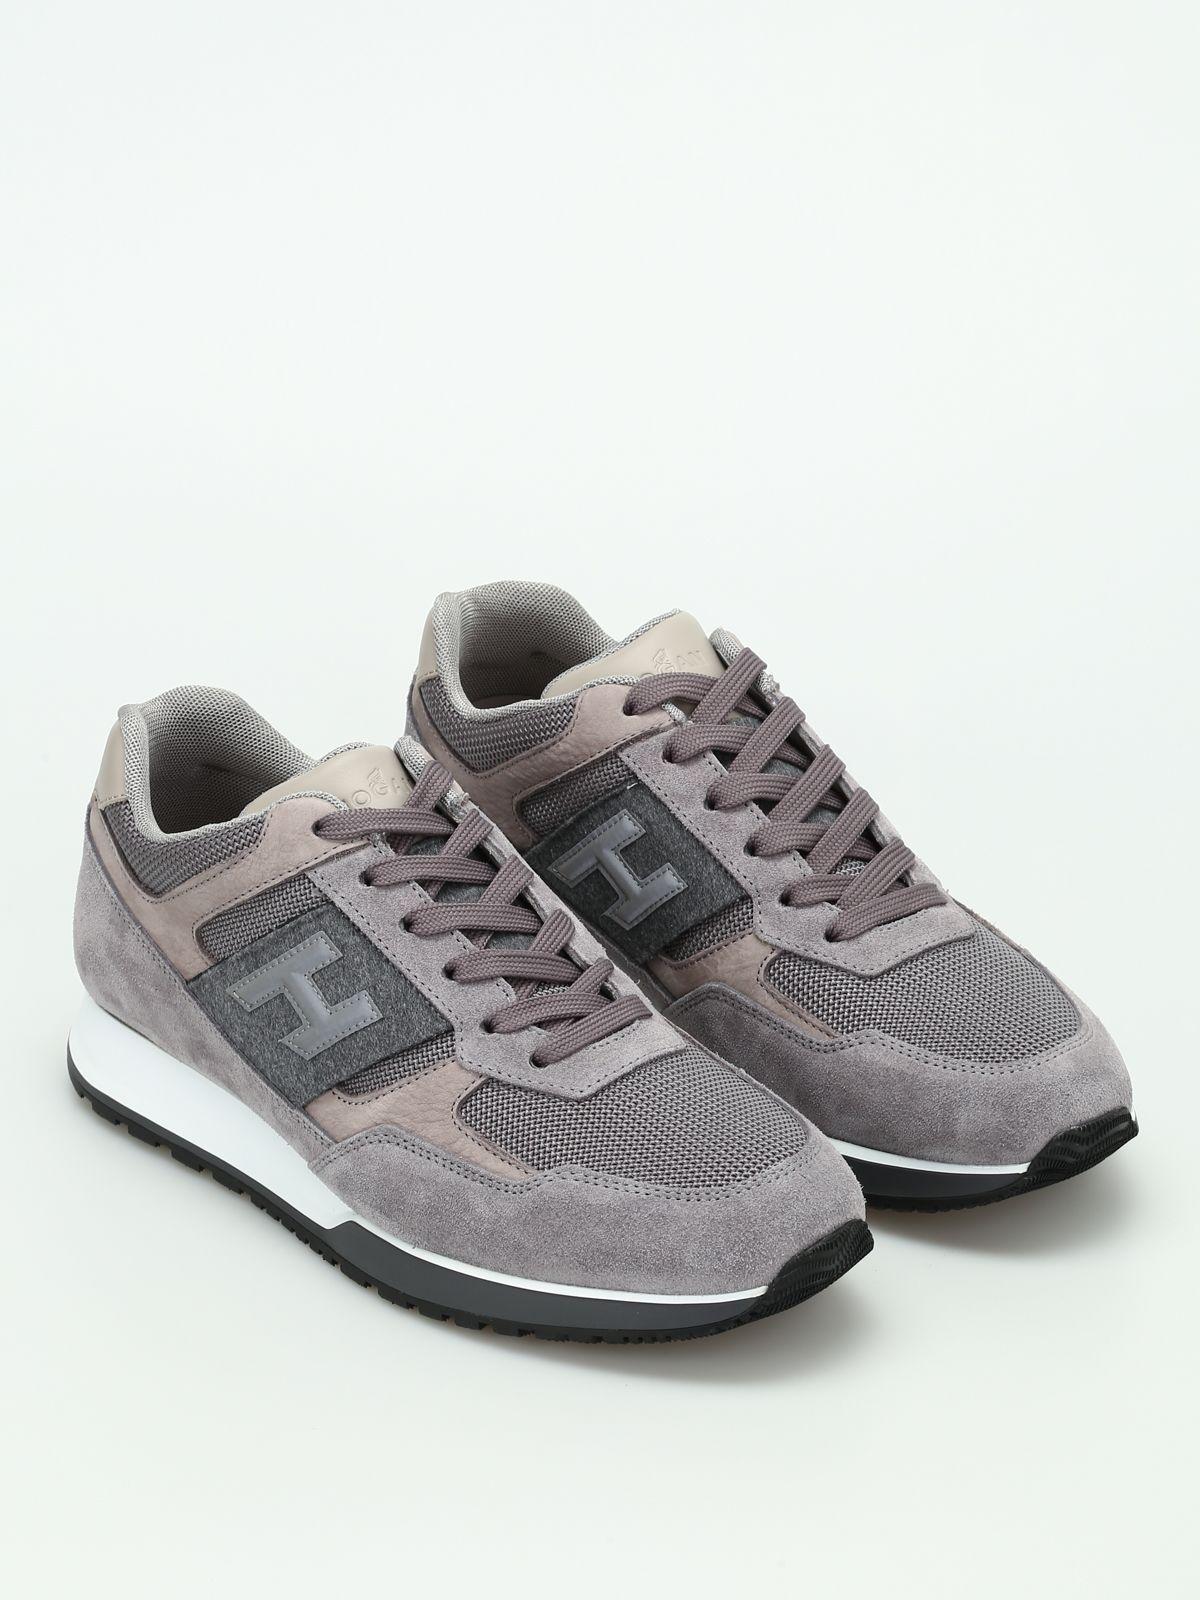 Hogan Sneaker Basse H321 In Dark Grey Modesens